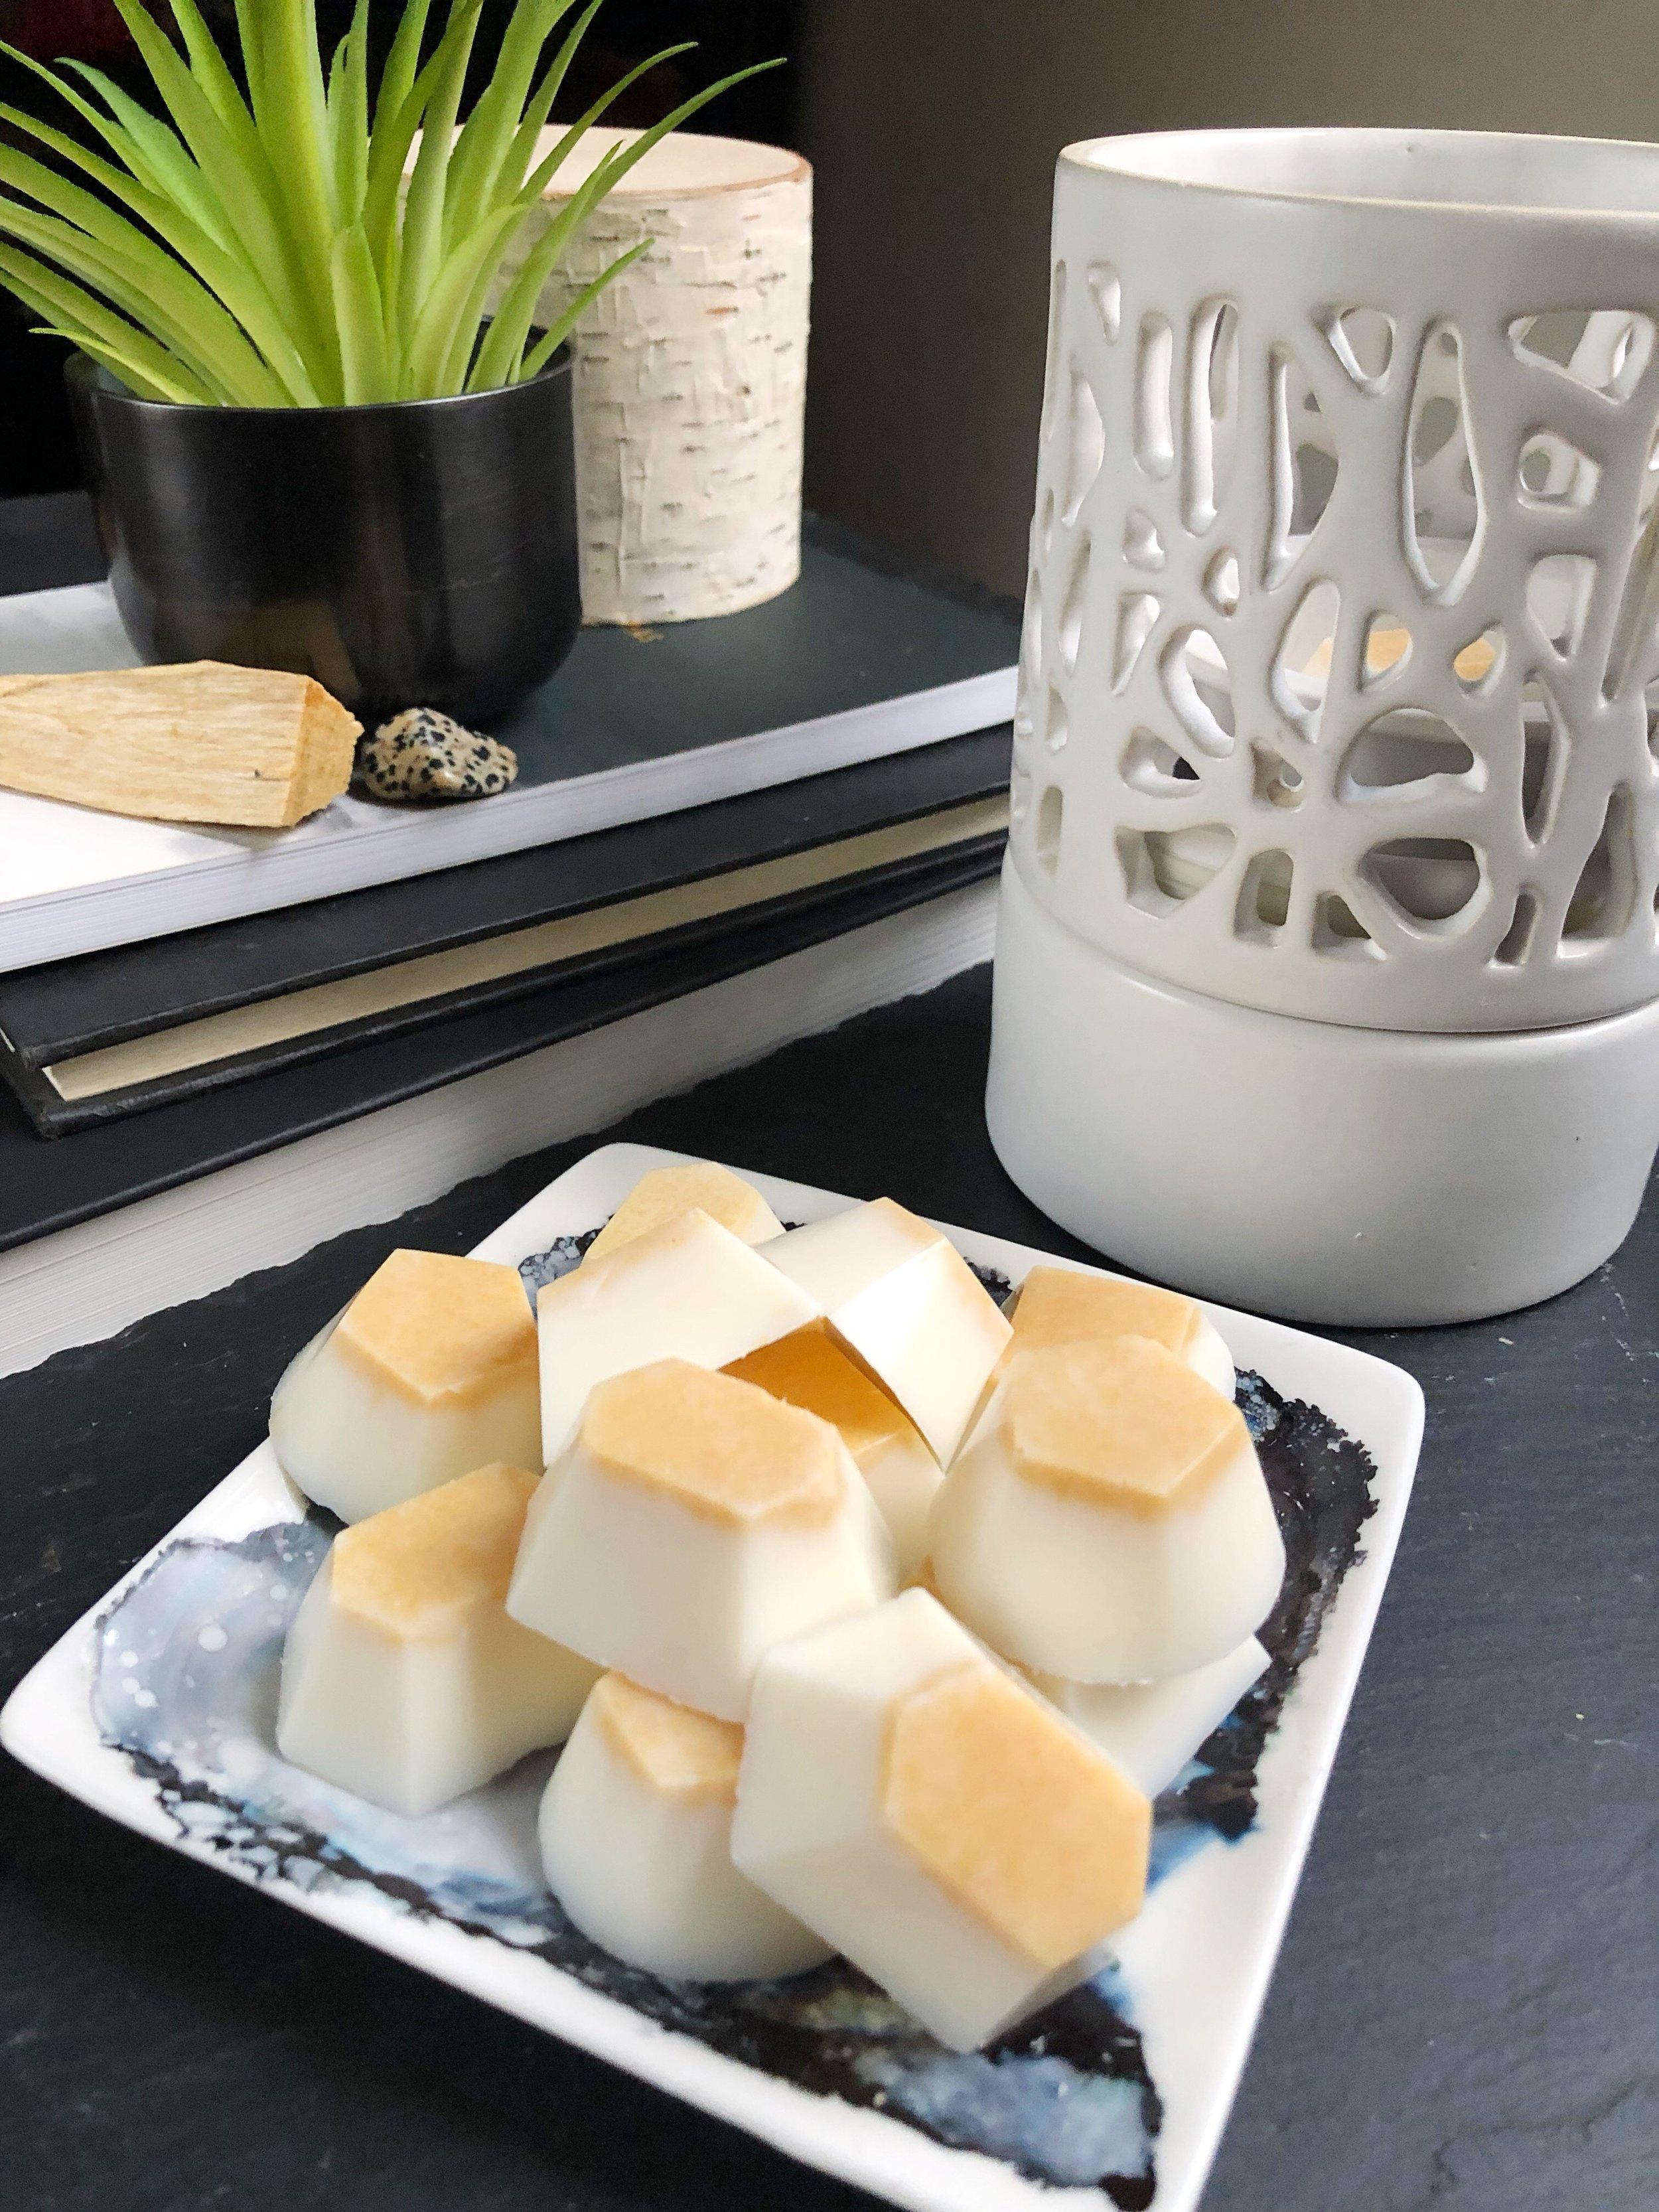 DIY Palo Santo Wax Melts #palosanto #soy #waxmelts #crystals #essentialoils #waxwarmer #candlemaking #candleDIY